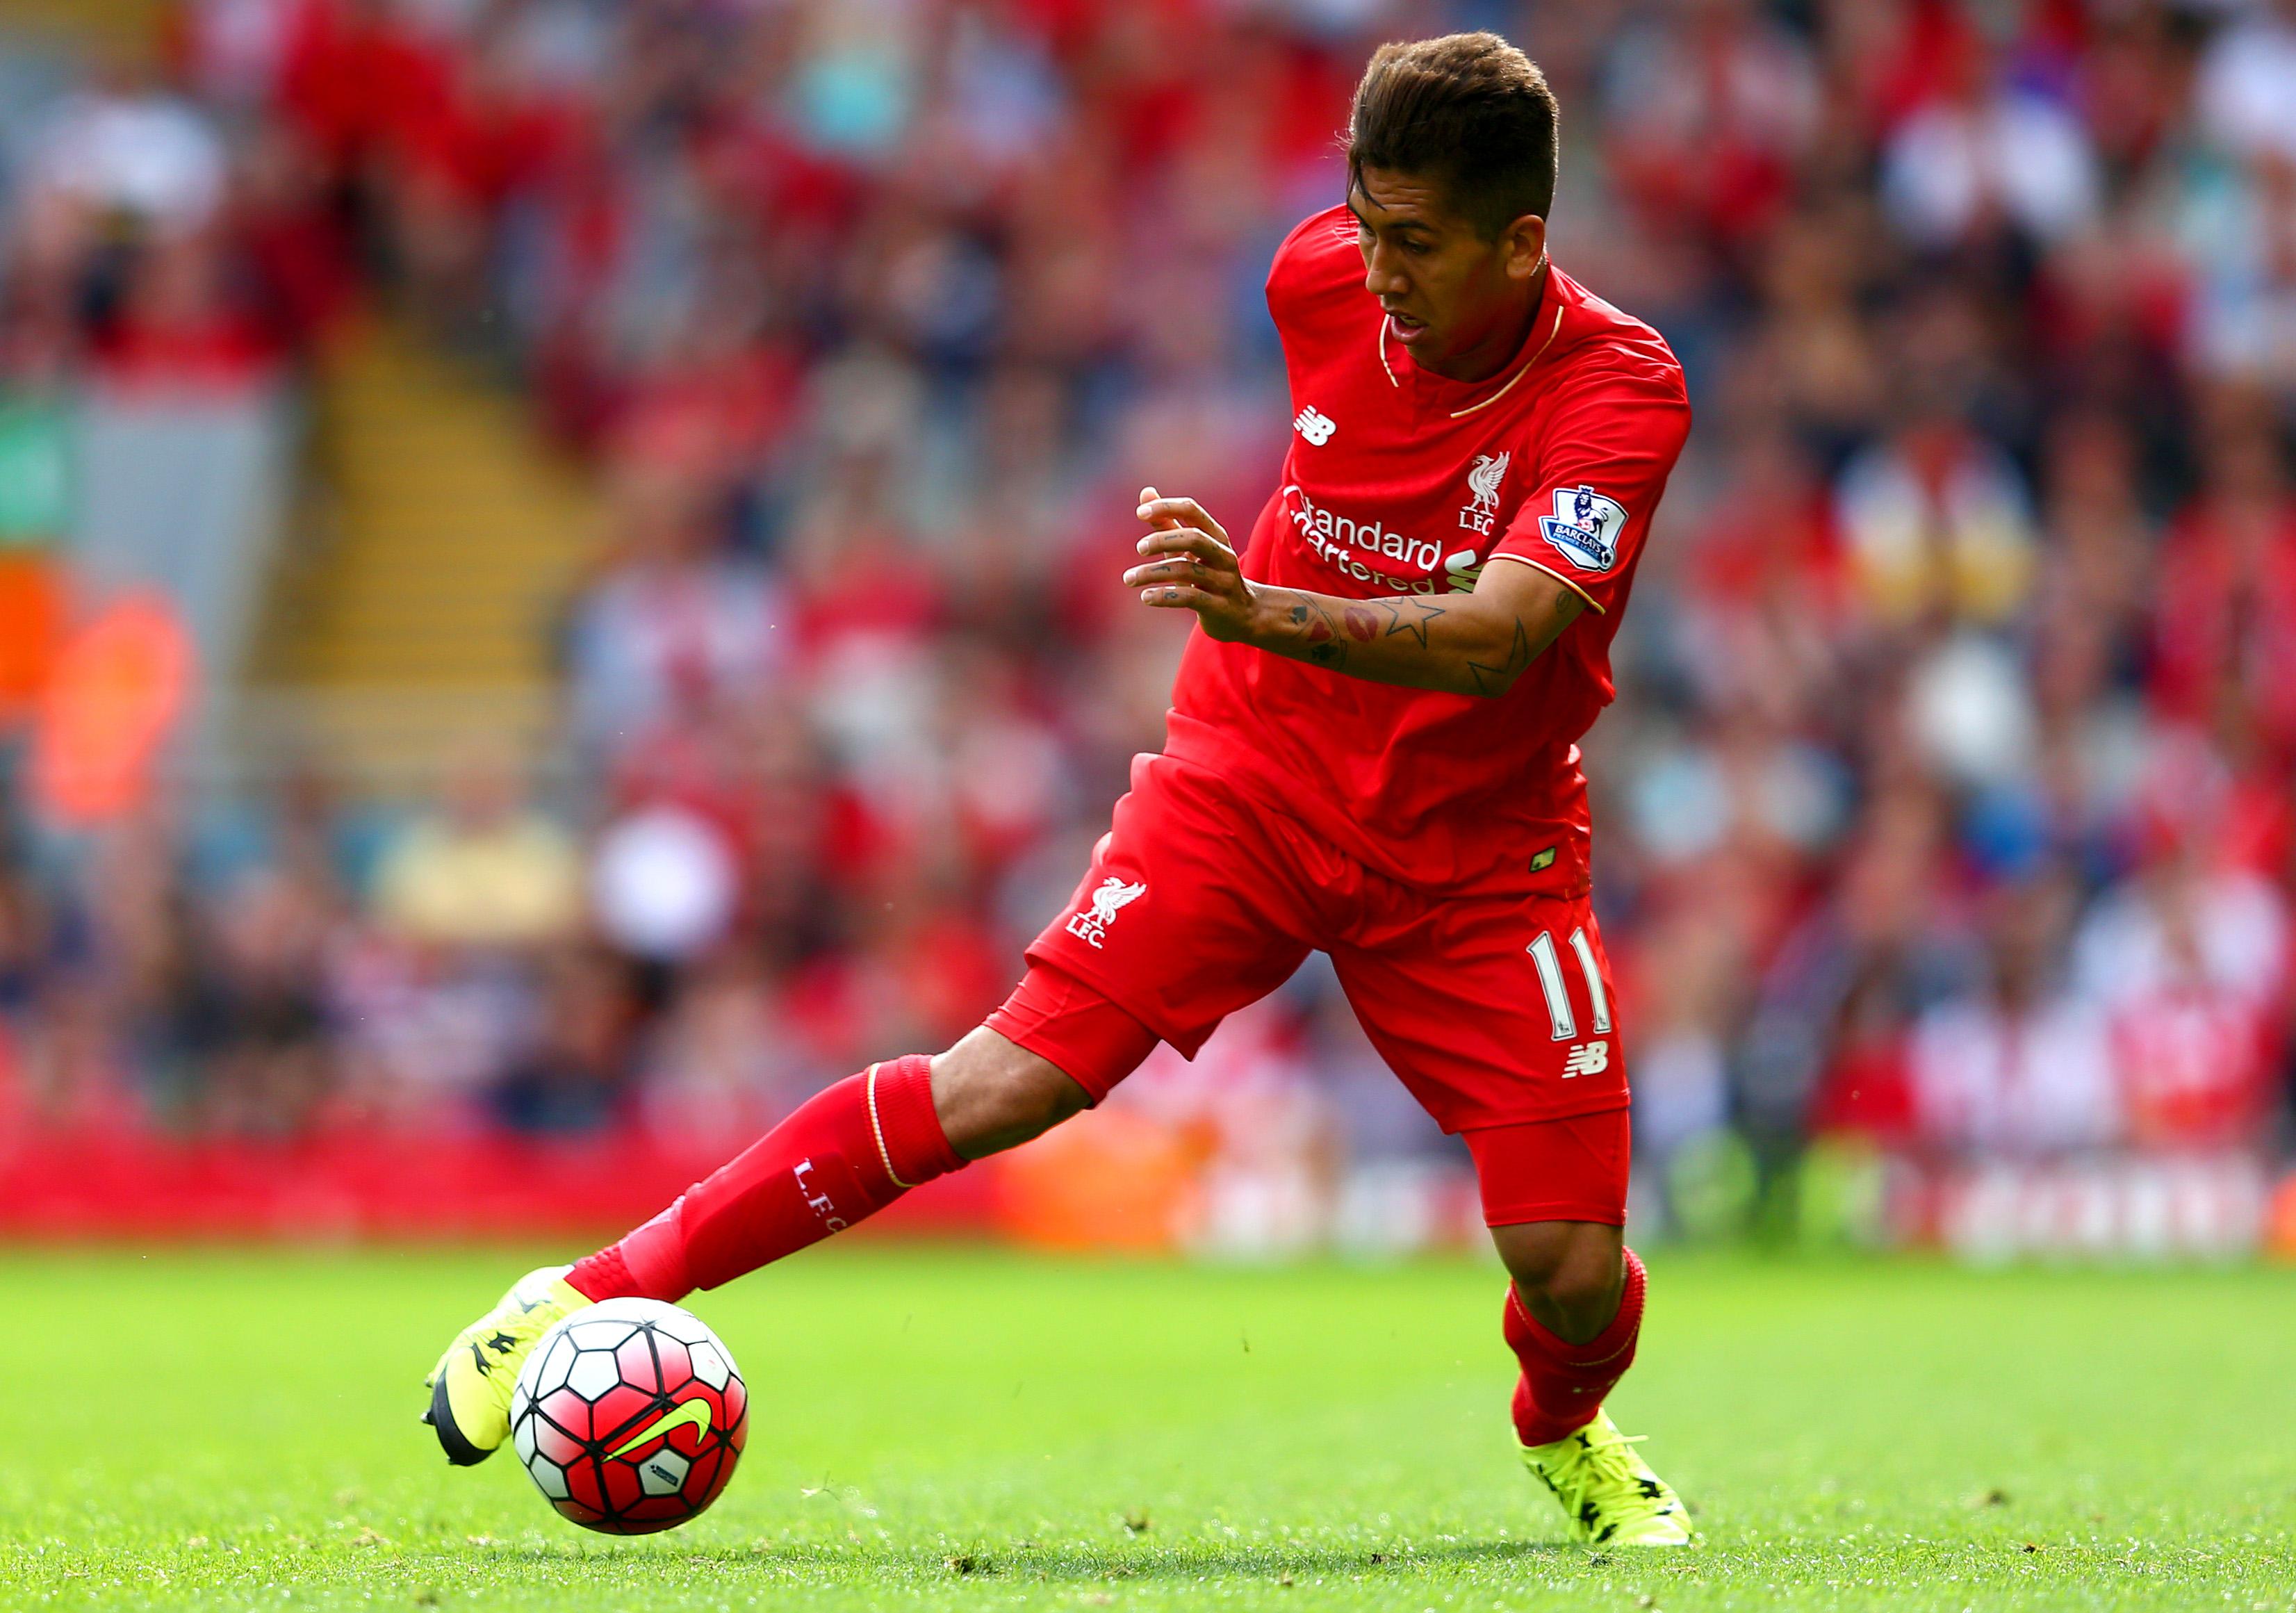 Liverpool: Straight To The Klopp: Liverpool's Revival Under Jurgen Klopp